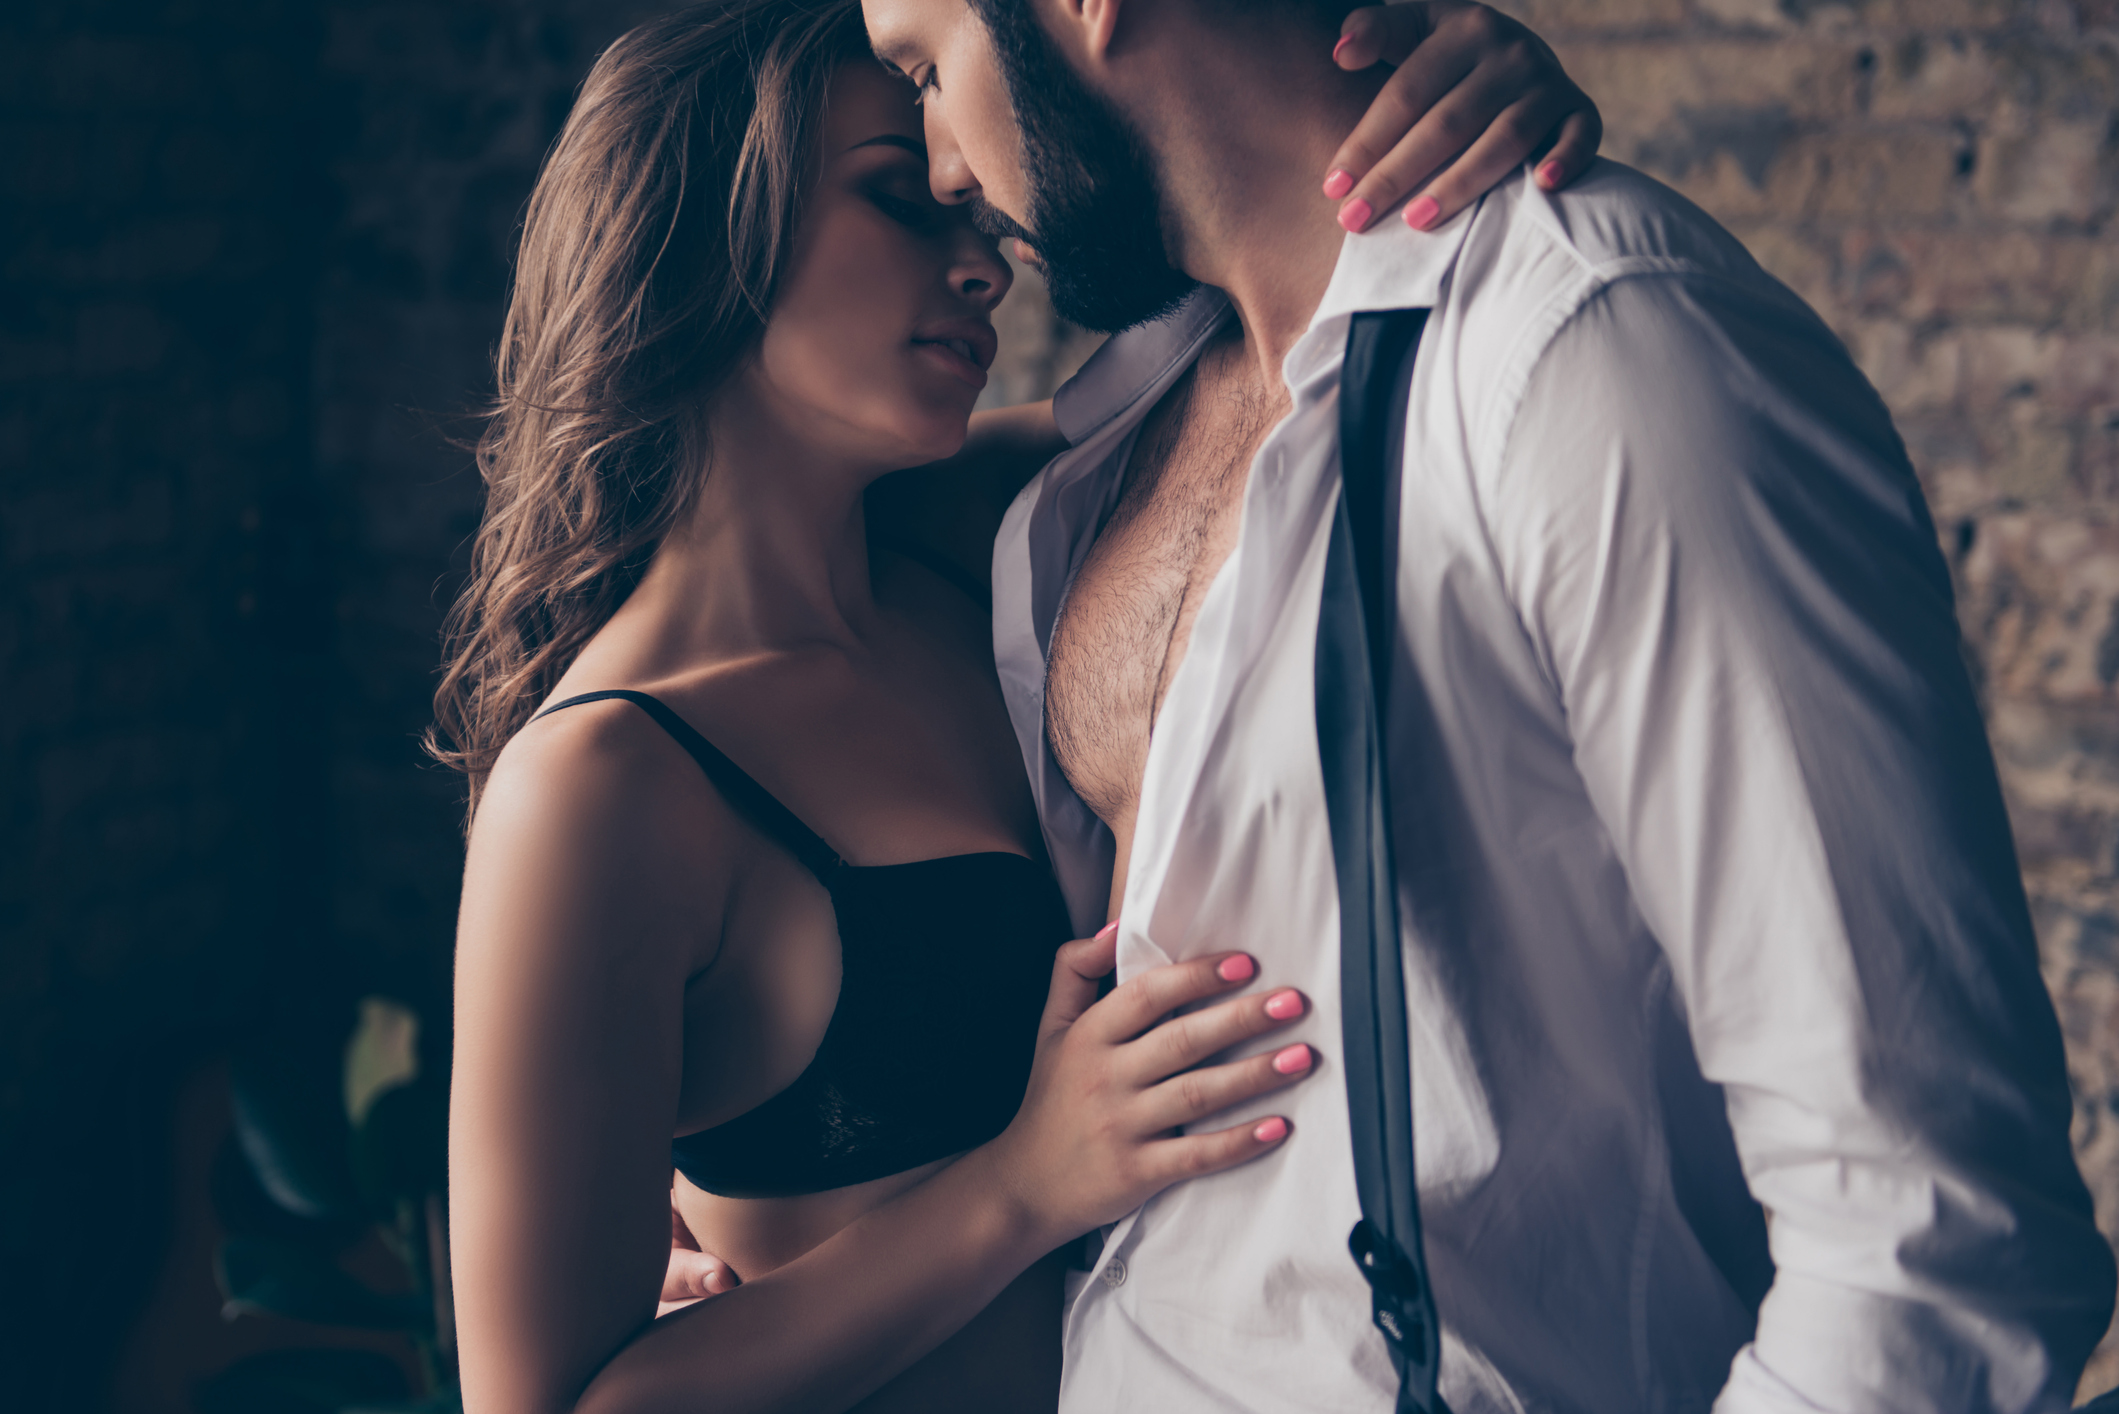 Uzročnici spolno prenosivih bolesti - virusi, bakterije, gljive, paraziti - mogu se prenijeti s kliconoše, naoko zdrave inficirane osobe, na nezaraženog spolnog partnera